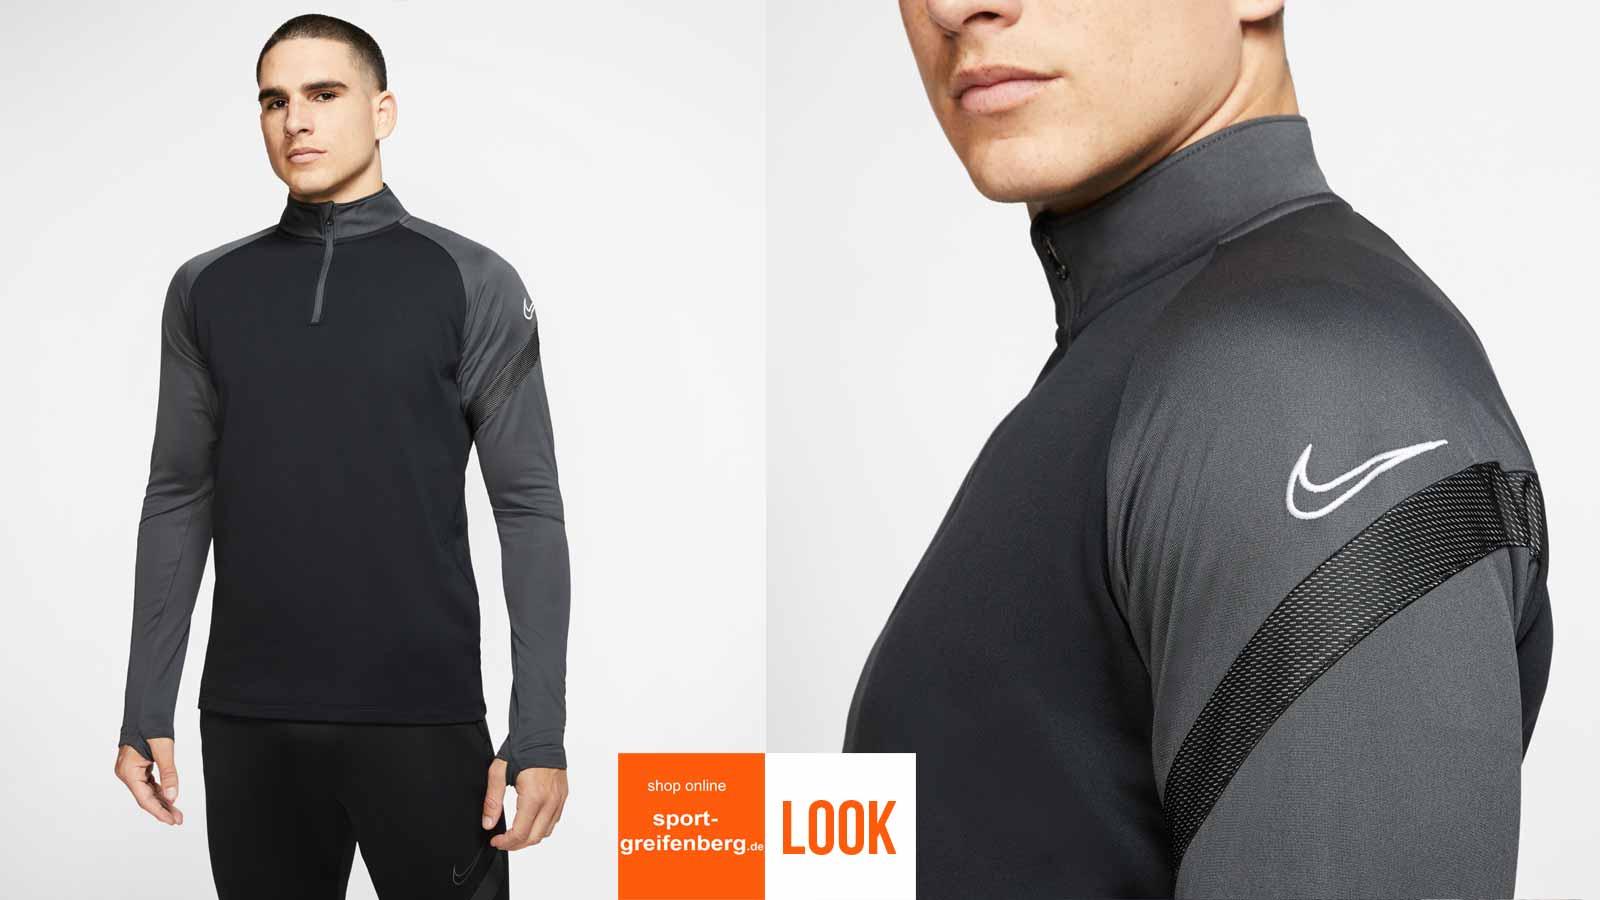 Das Nike Academy Pro Training Outfit mit Midlayer und Training Pant